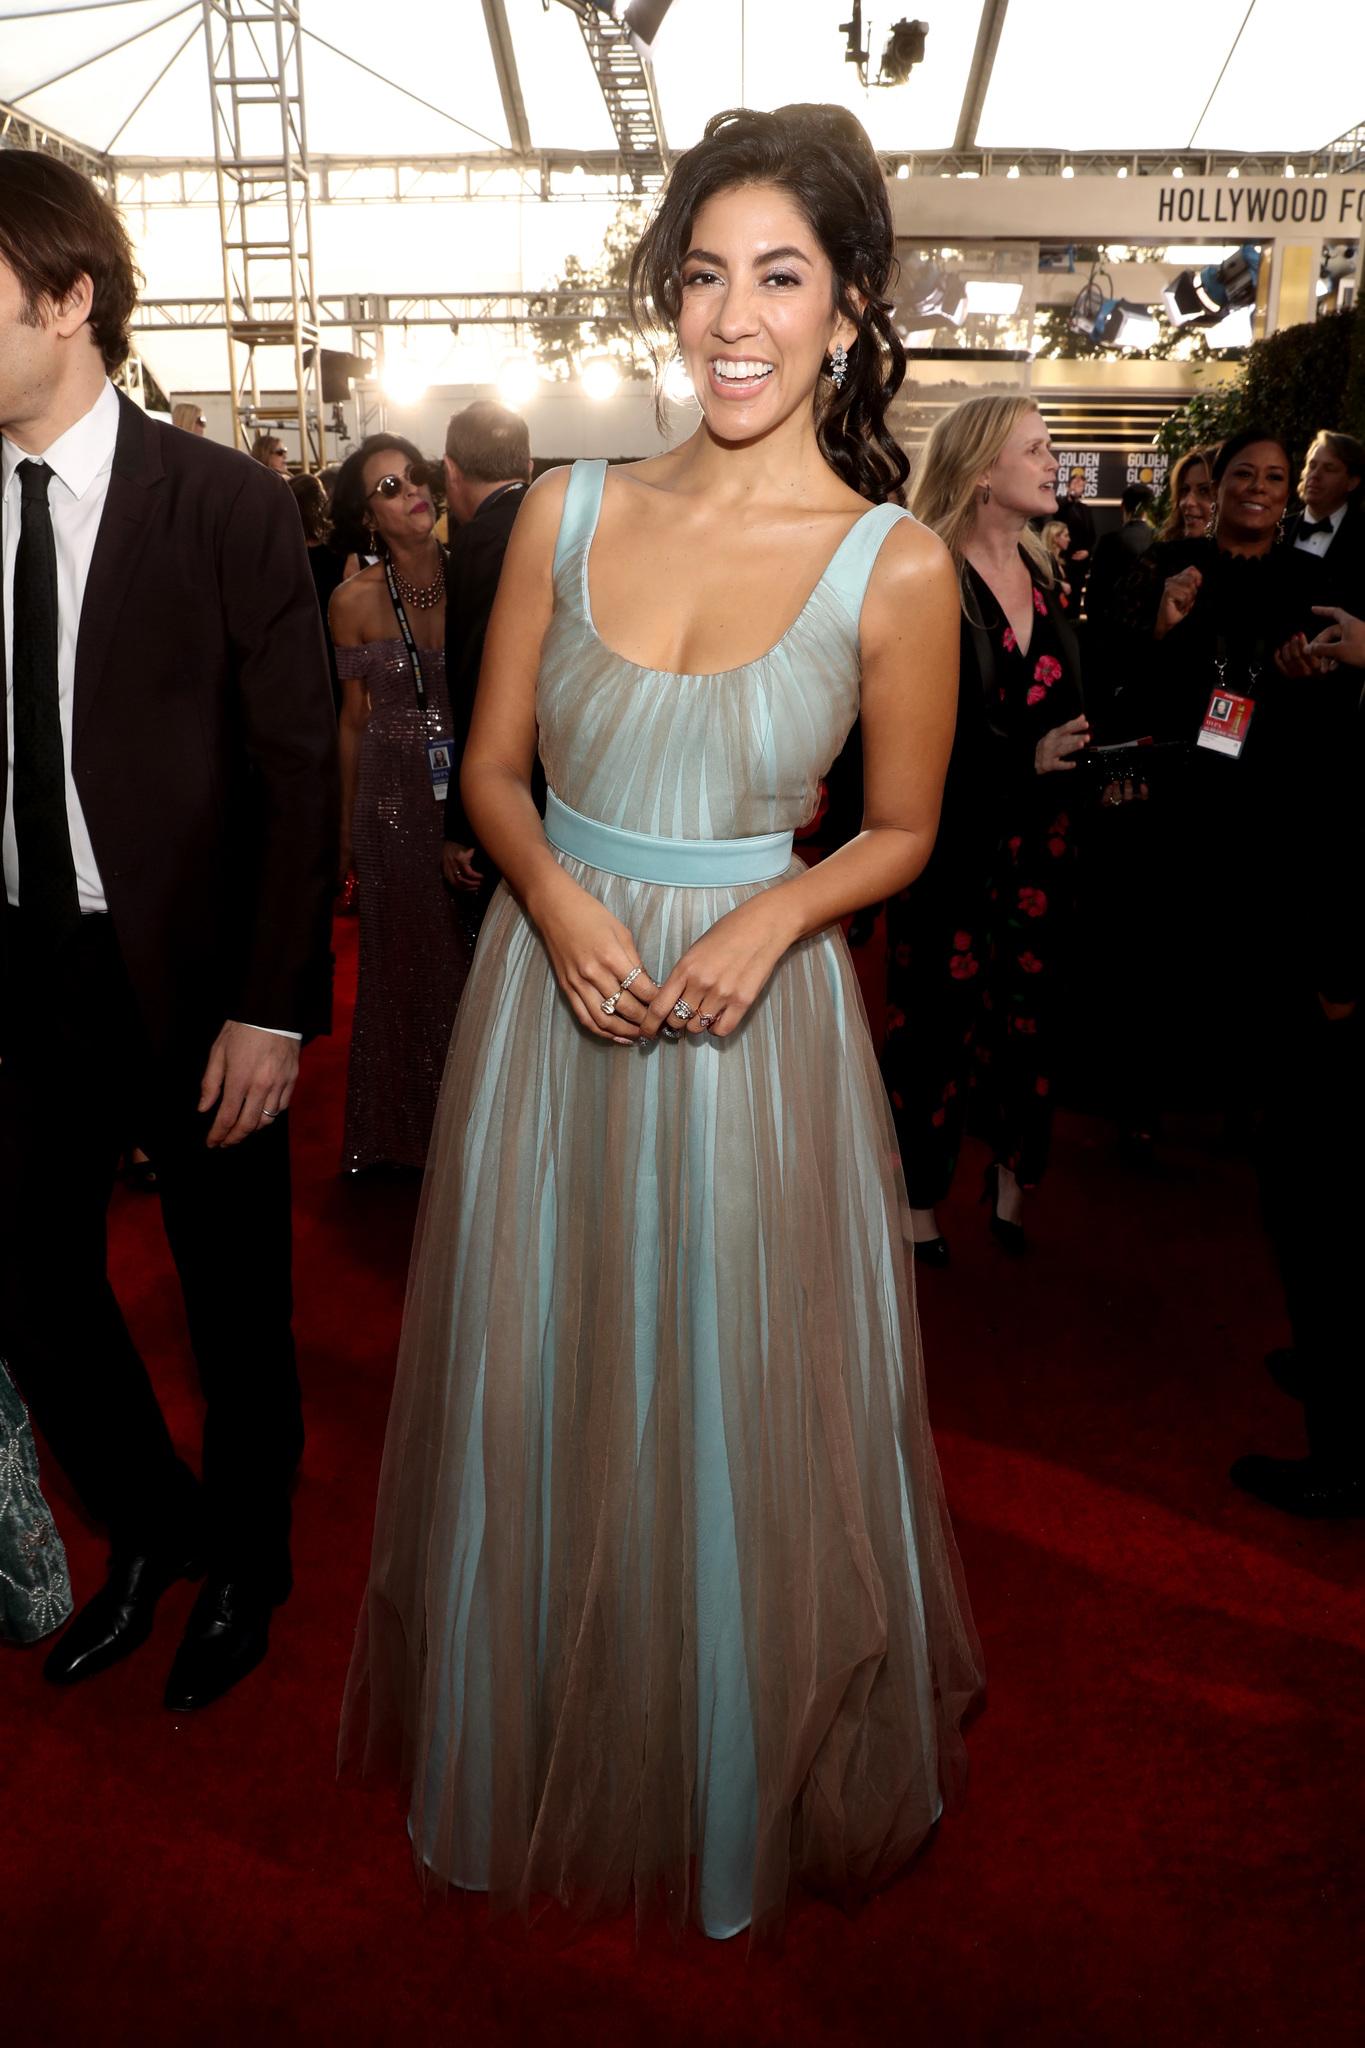 Stephanie Beatriz at an event for 2019 Golden Globe Awards (2019)